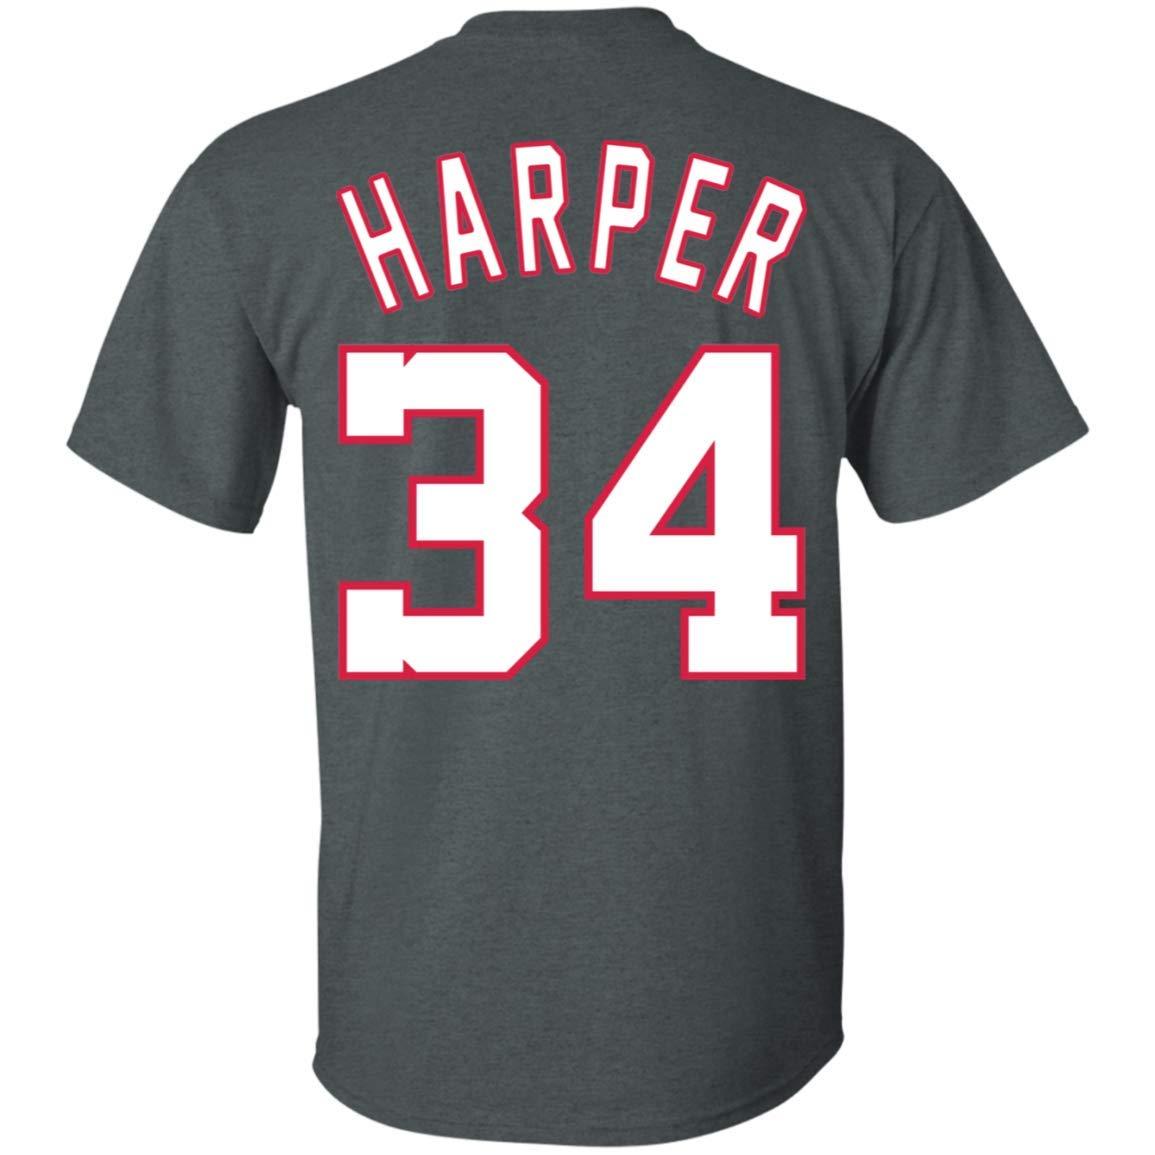 Pixhe Harper 34 T Shirt 1485